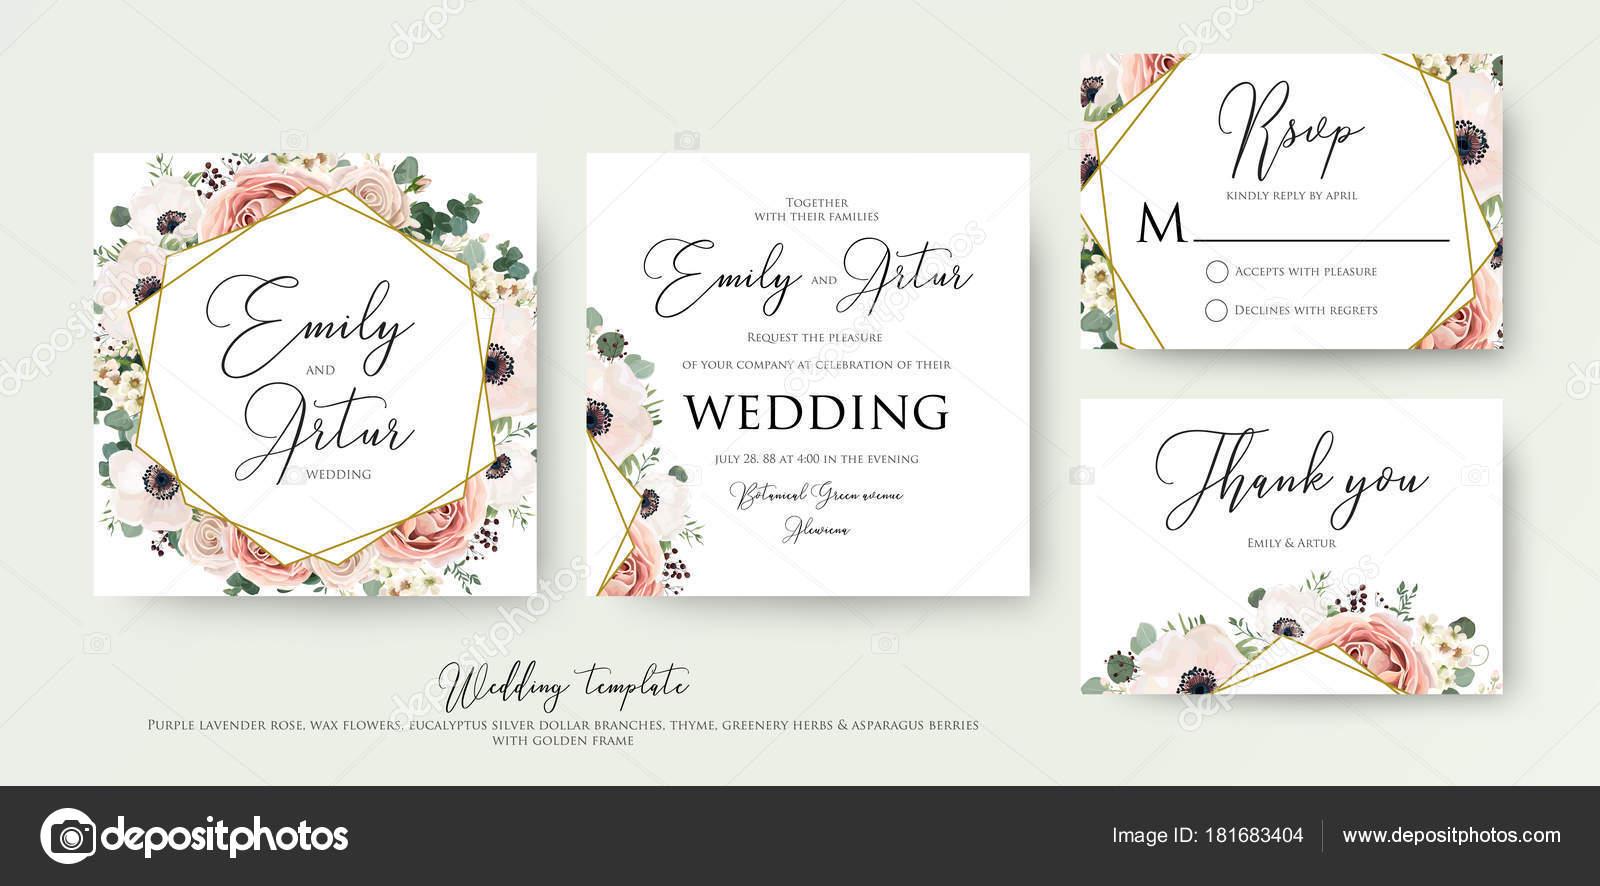 Floral Wedding Invitation elegant invite, thank you, rsvp card ...